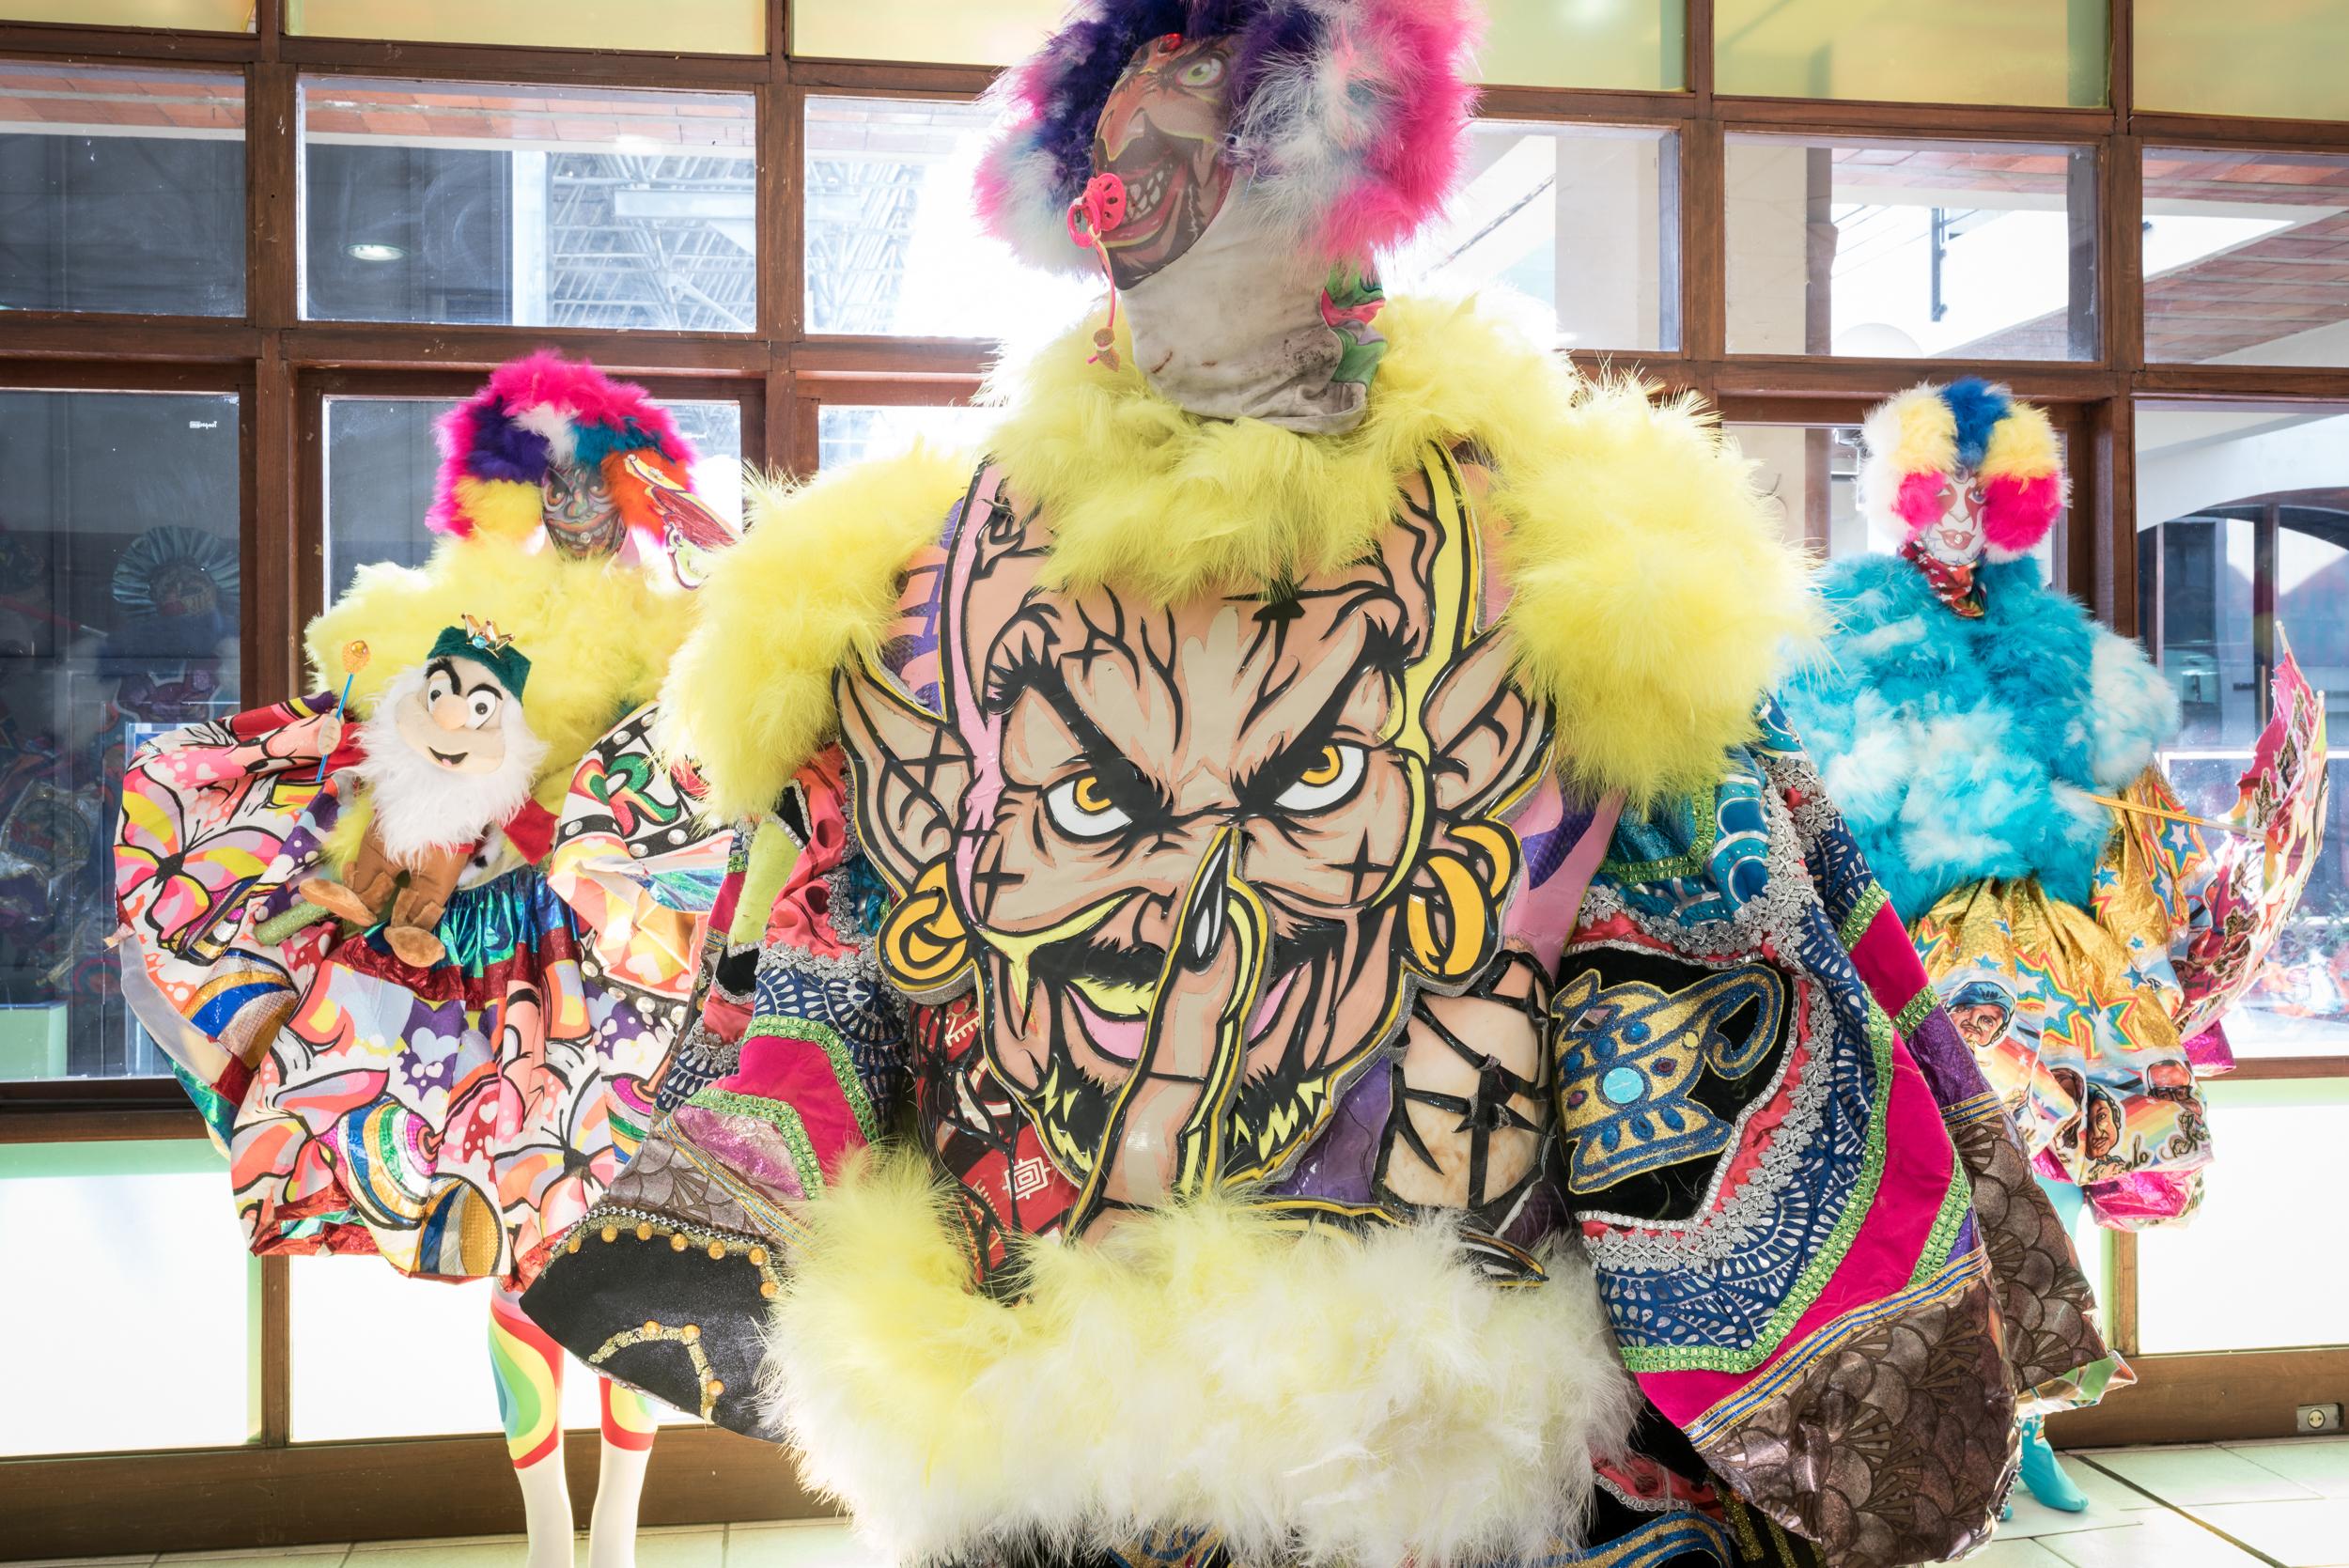 Bate-Bola - Rio Carnaval Secreto